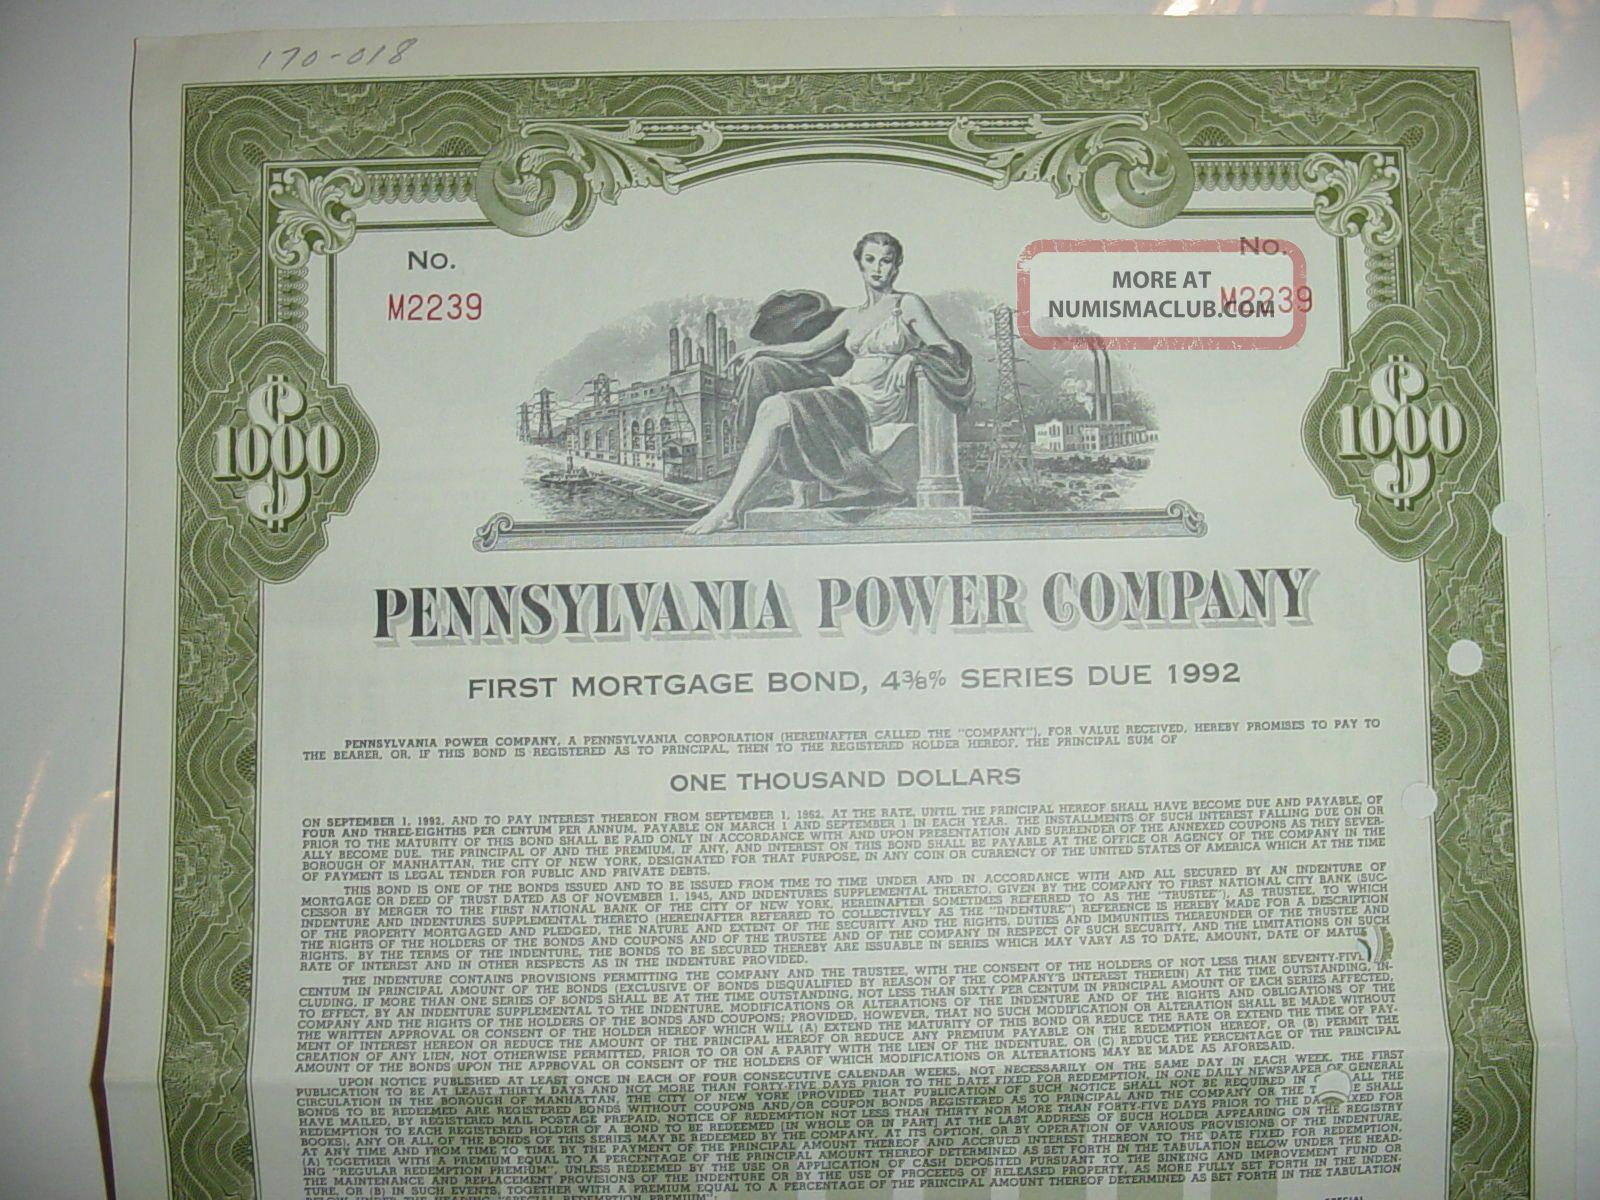 1962 Pennsylvania Power Company Bond Stock Certificate First Energy Stocks & Bonds, Scripophily photo